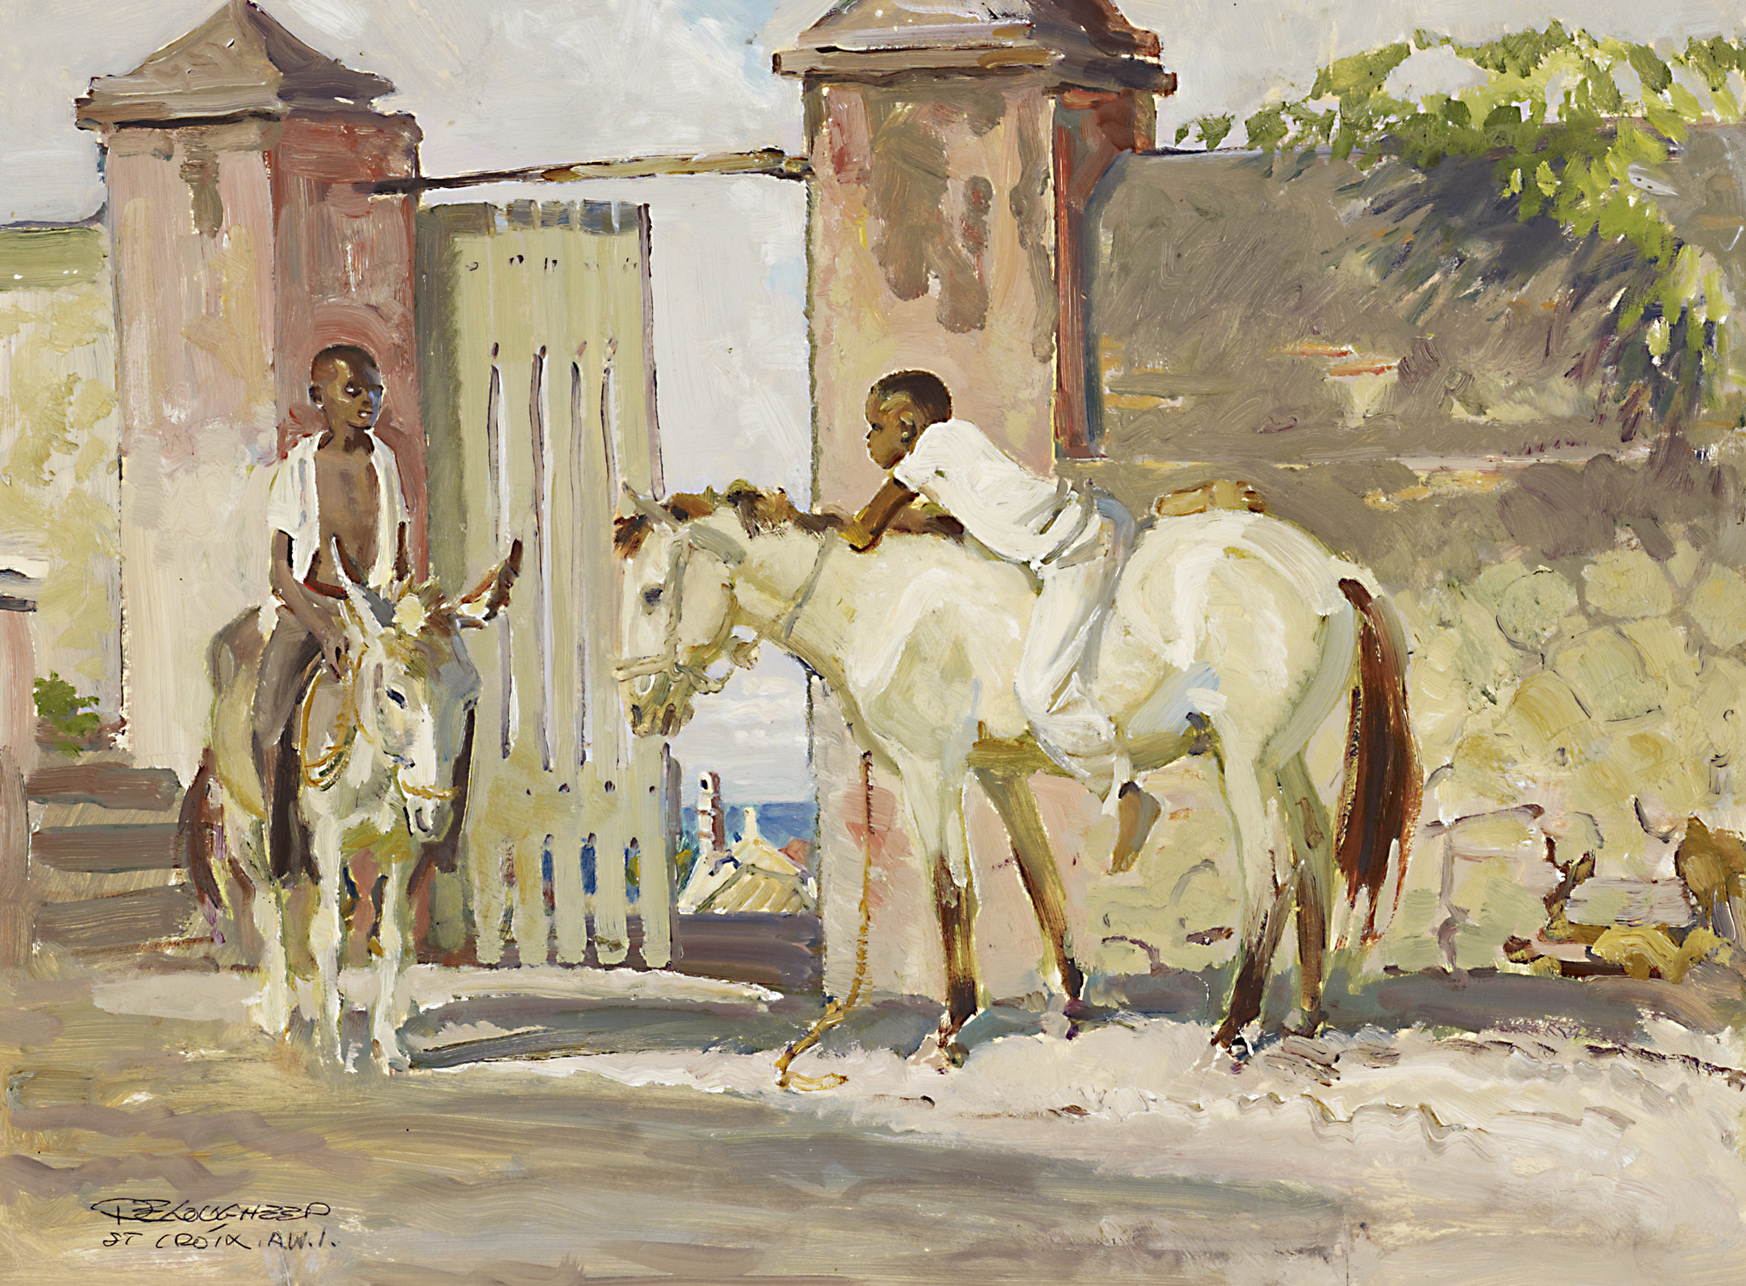 Donkey Sugarcane an... by  Robert Lougheed - Masterpiece Online